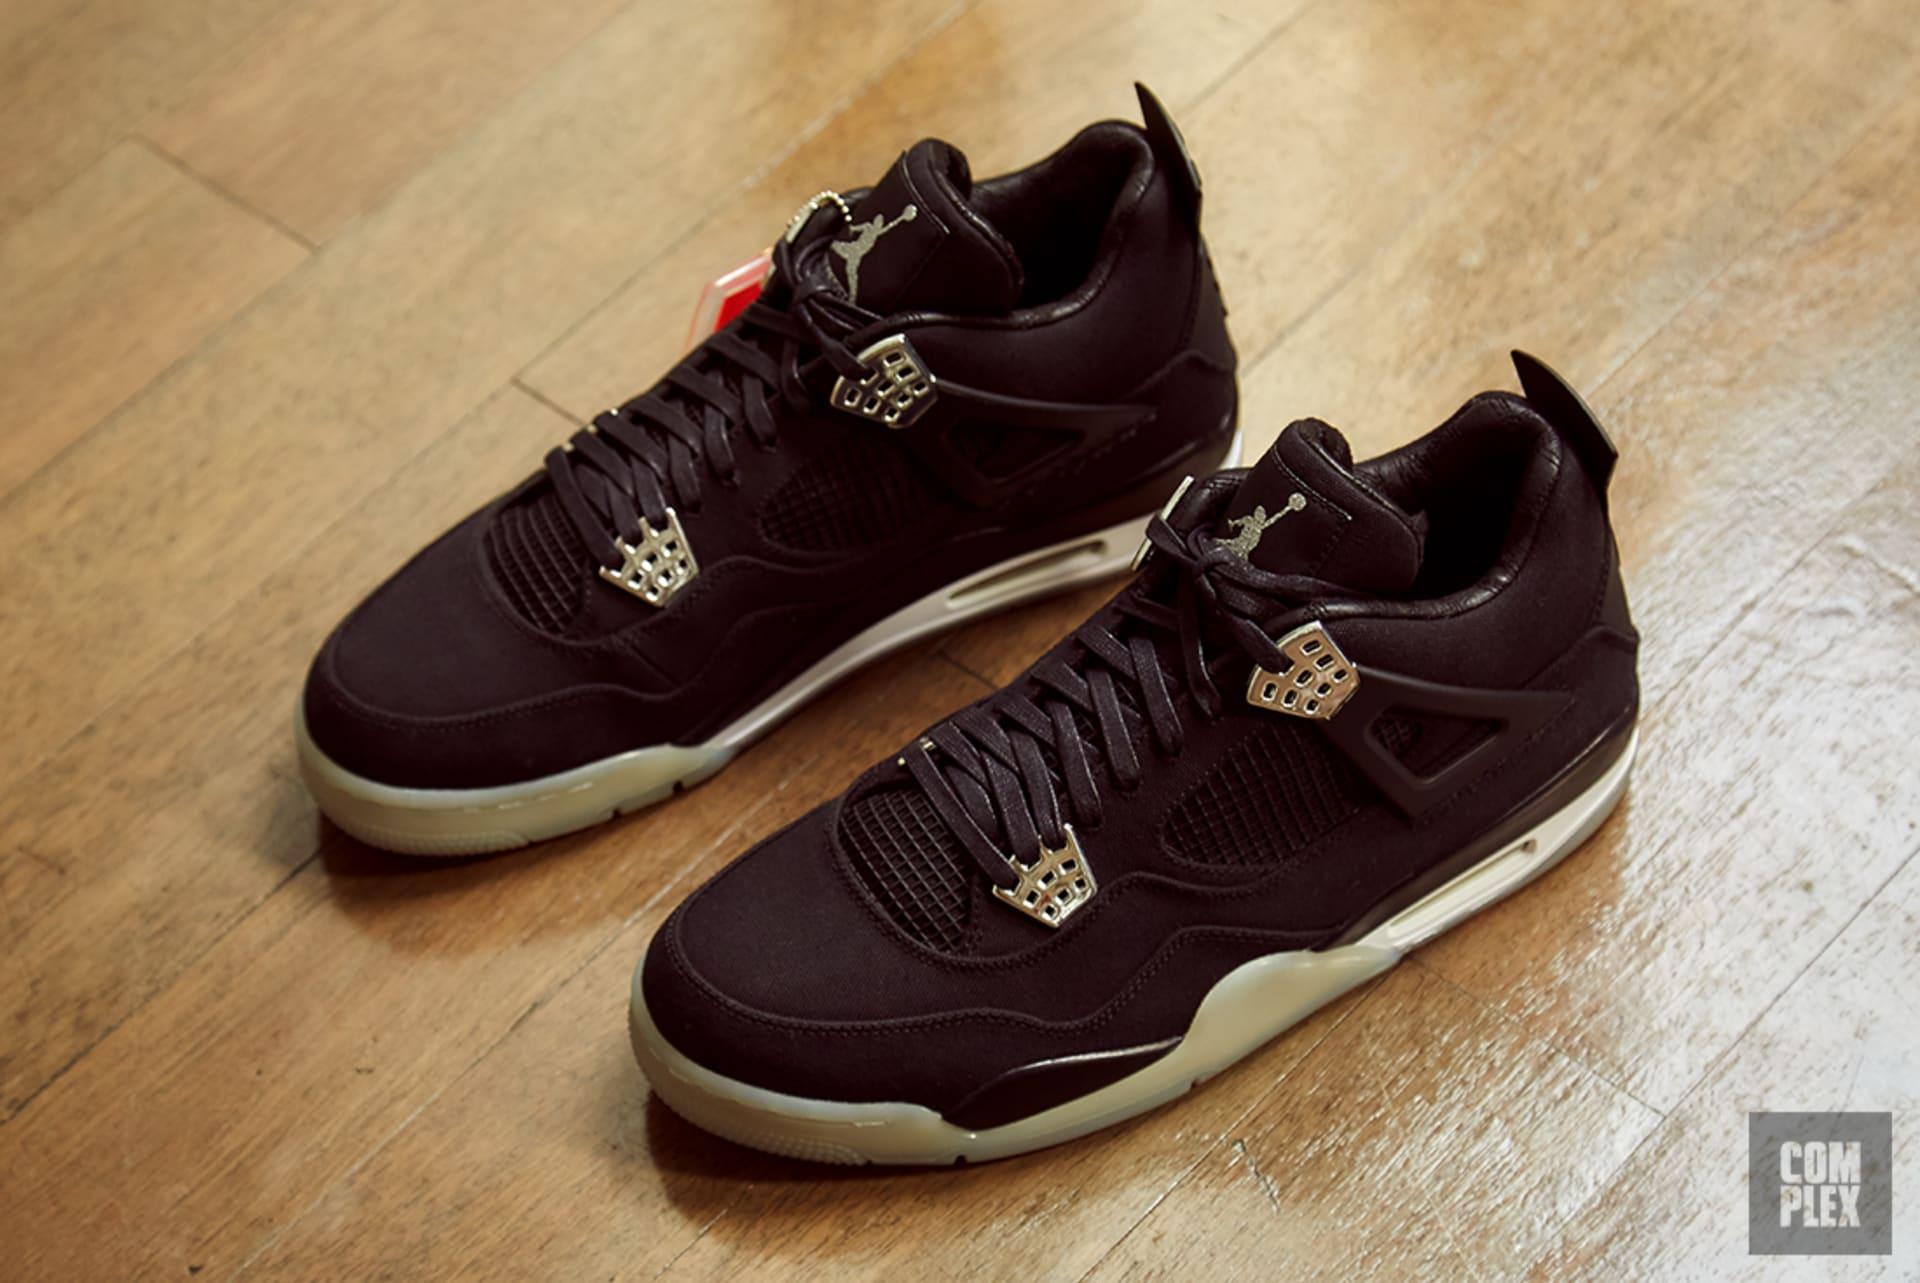 1e6f6c0bf23a76 Air Jordan 4  How The Sneaker Became a Cultural Phenomenon